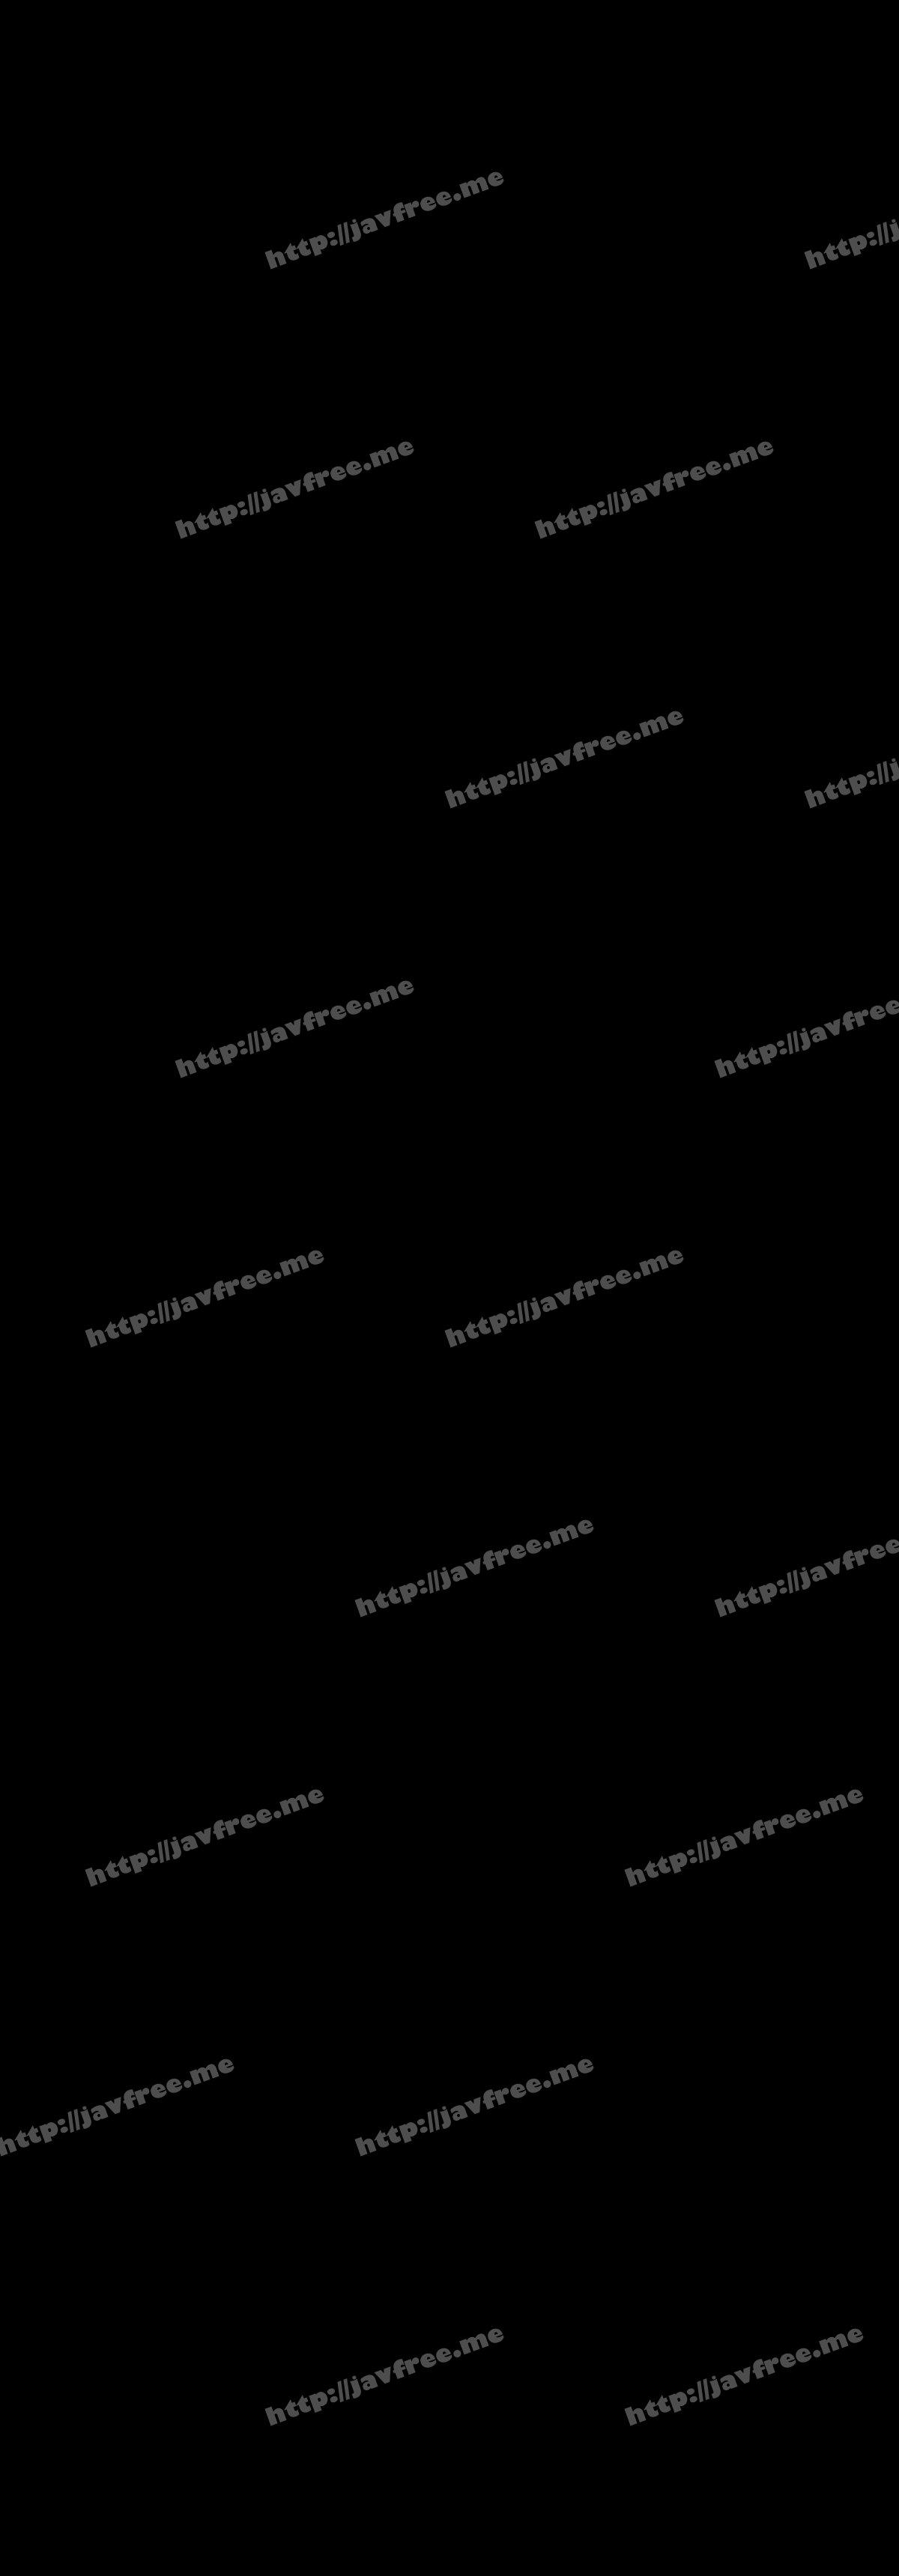 [HD][ARSO-19121] 舞ワイフ ~セレブ倶楽部~ 121 - image ARSO-19121-1080p on https://javfree.me